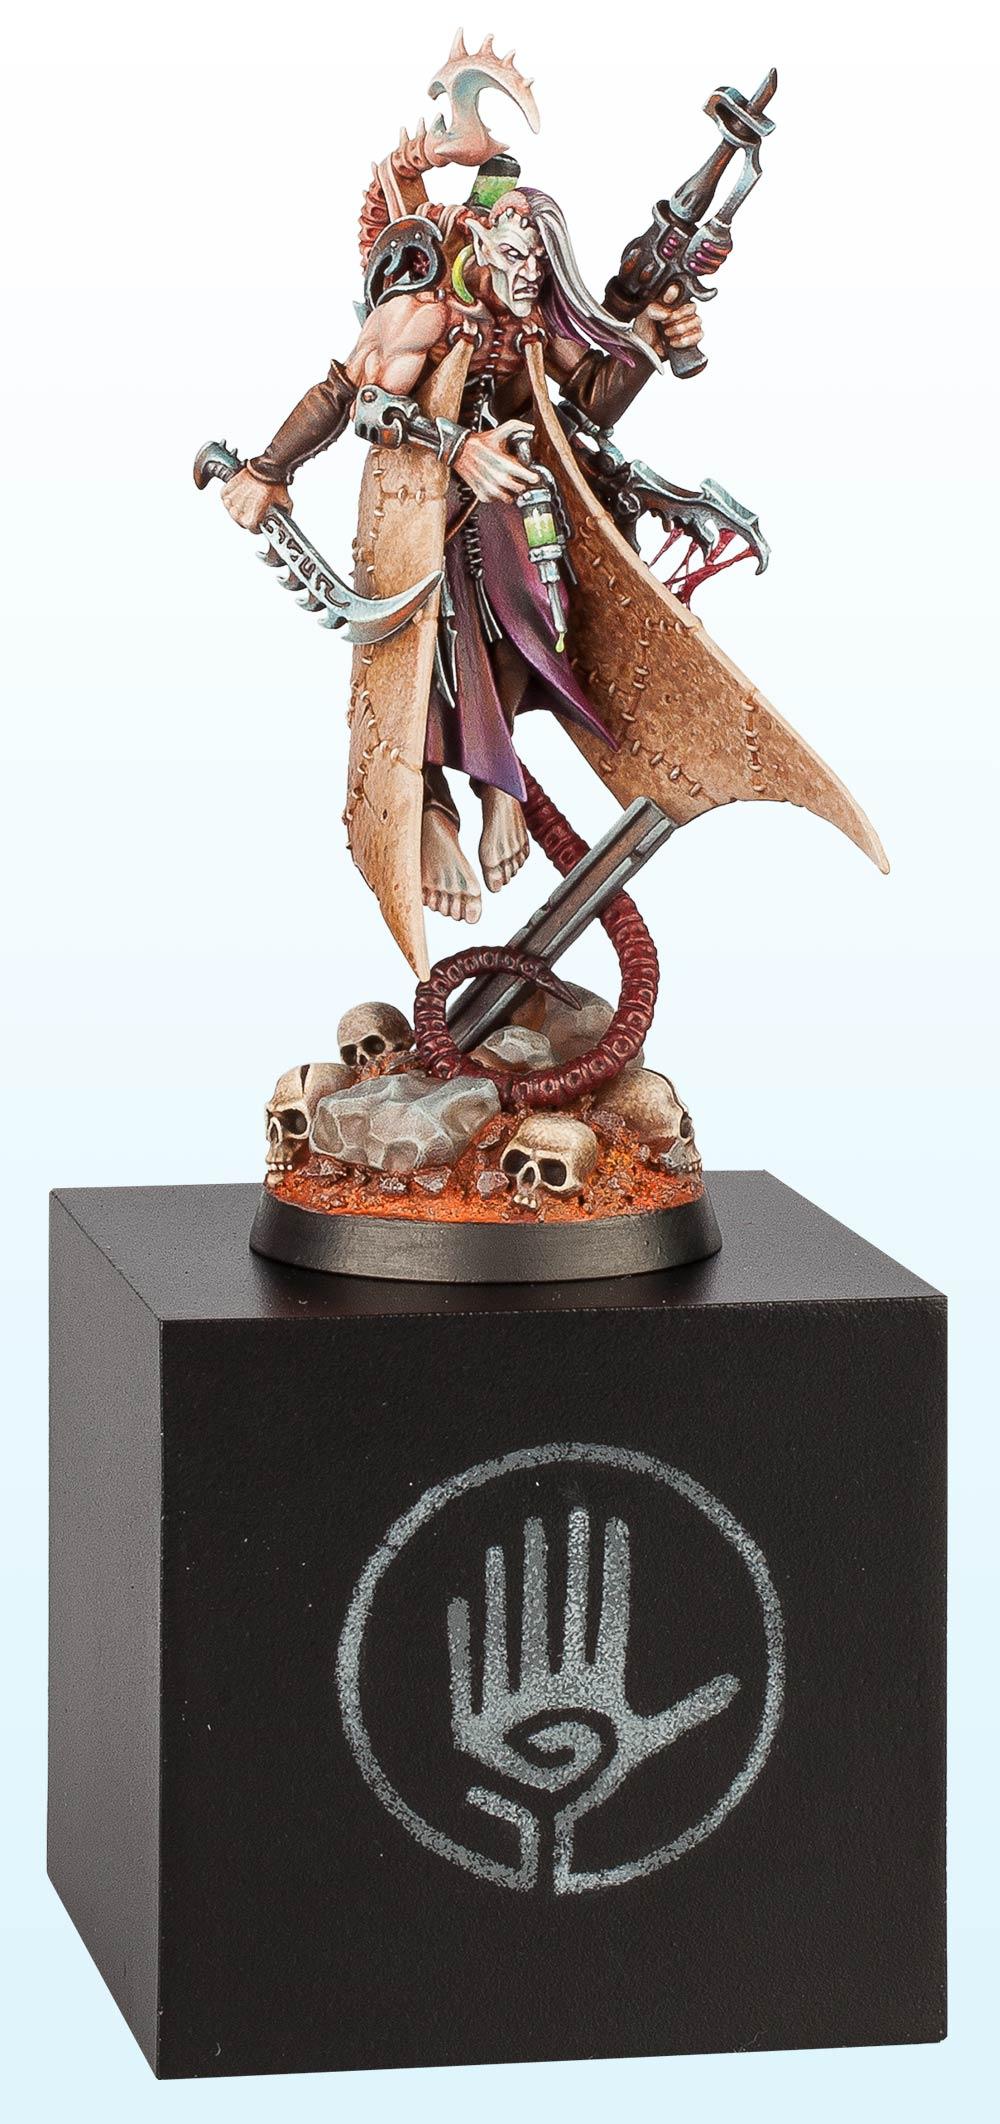 Warhammer 40,000 Single Miniature: Bronze – 2014